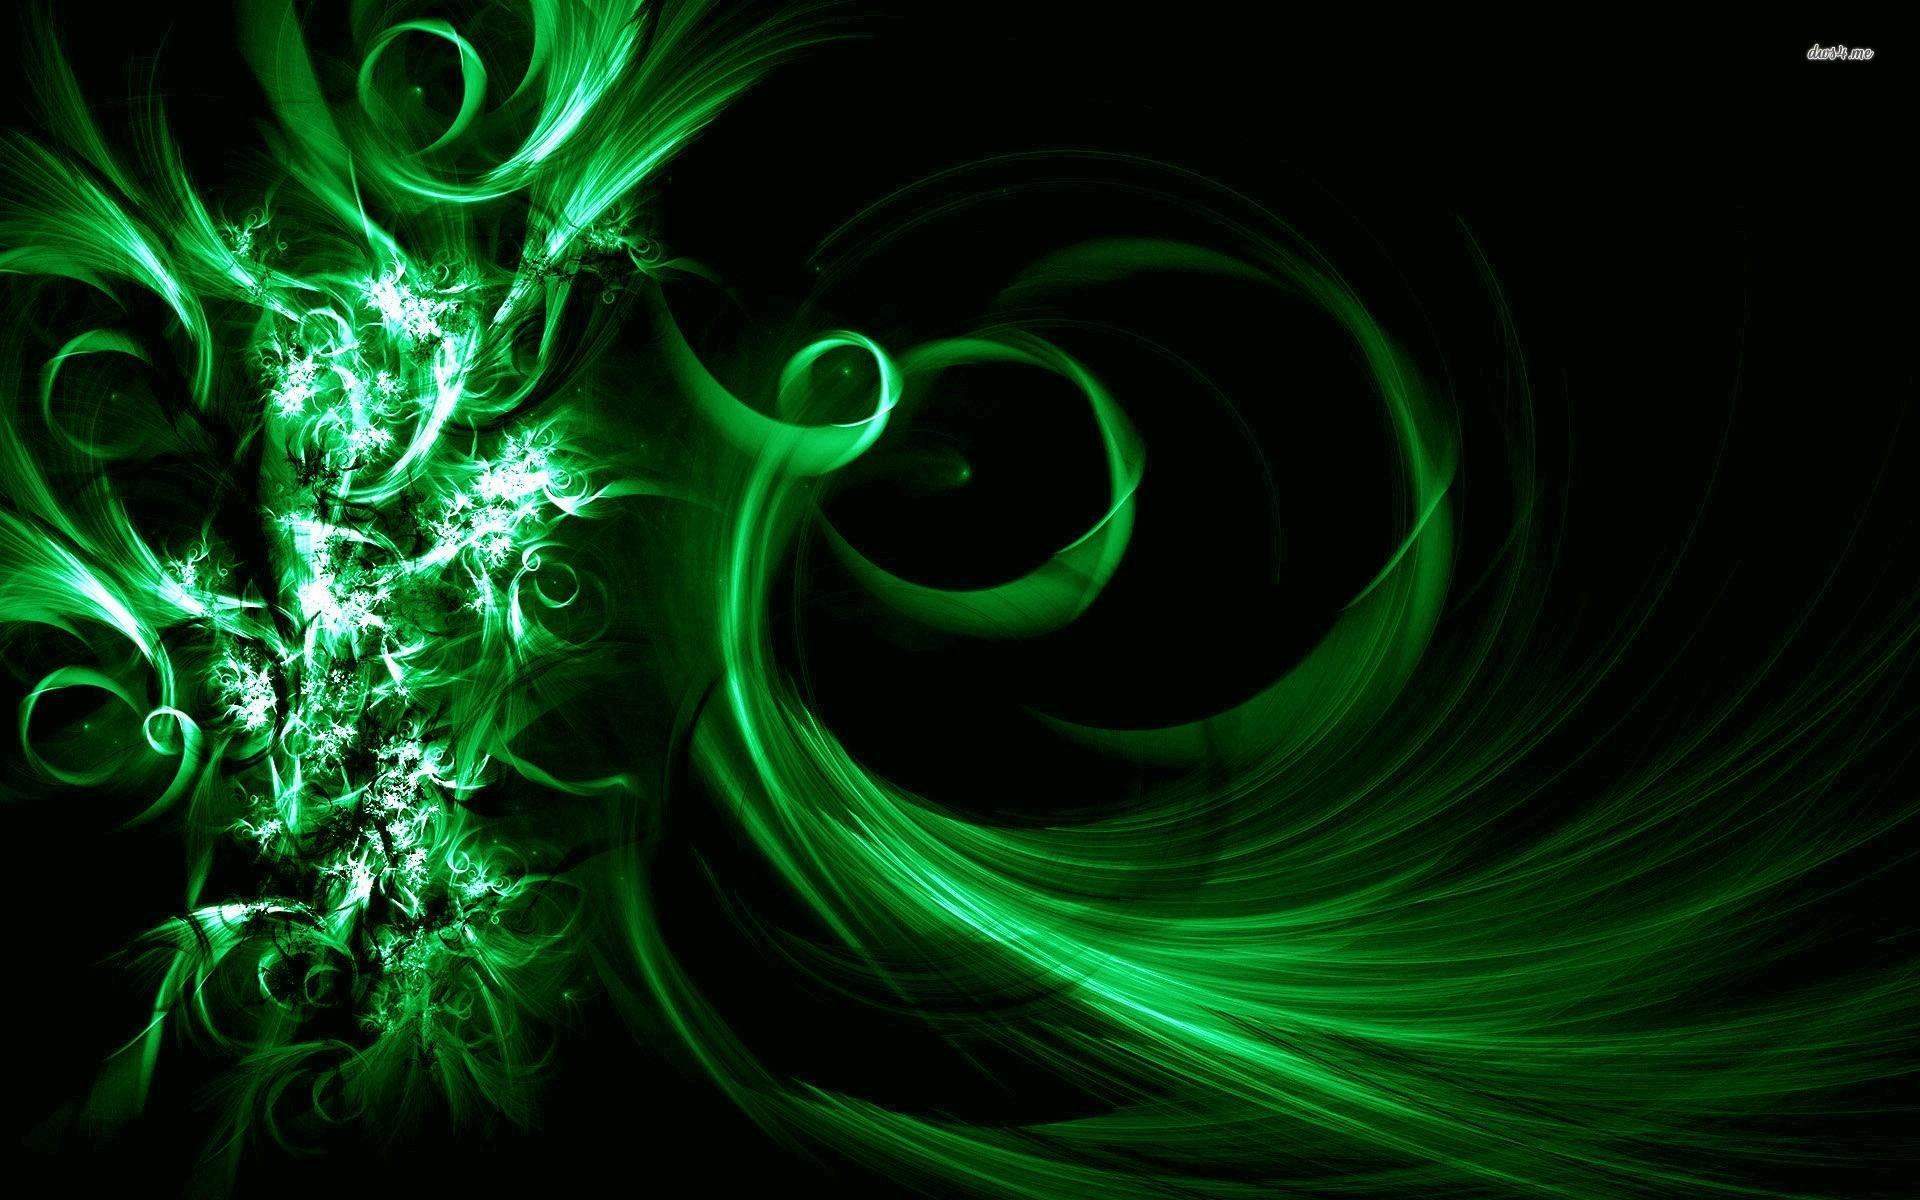 Download Green Cool Wallpaper Hd Backgrounds Download Itl Cat